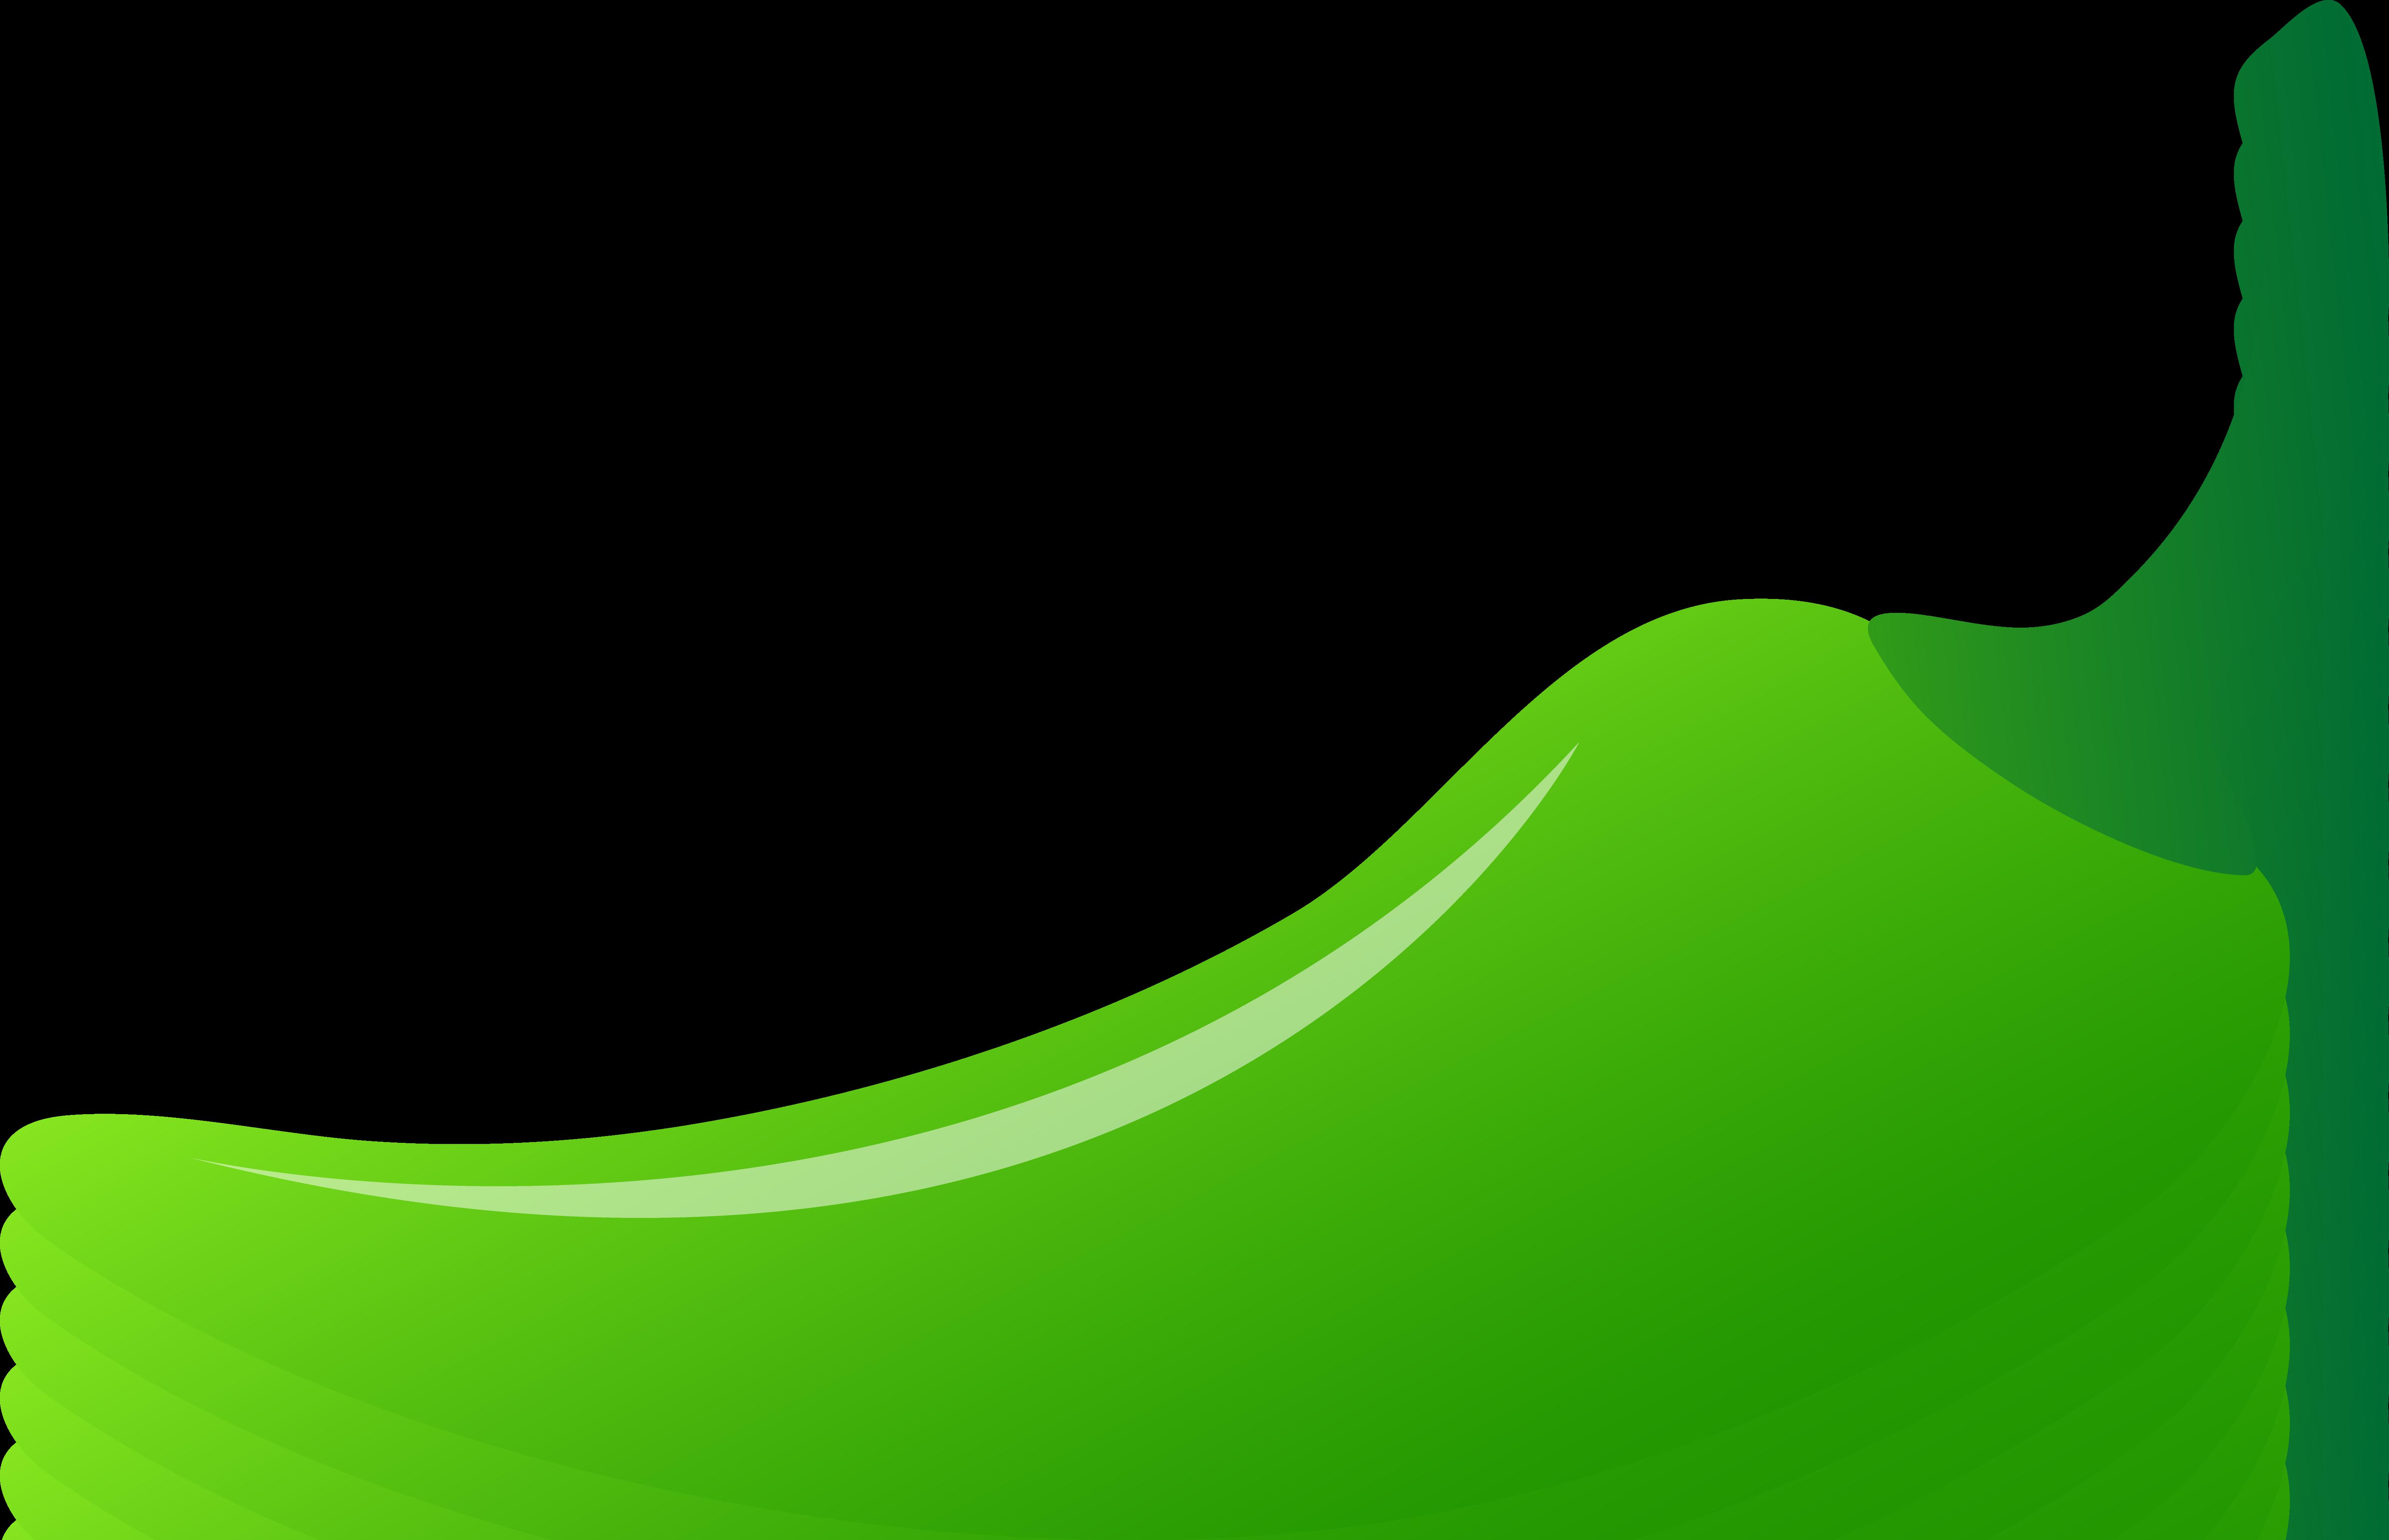 Jalapeno Vector